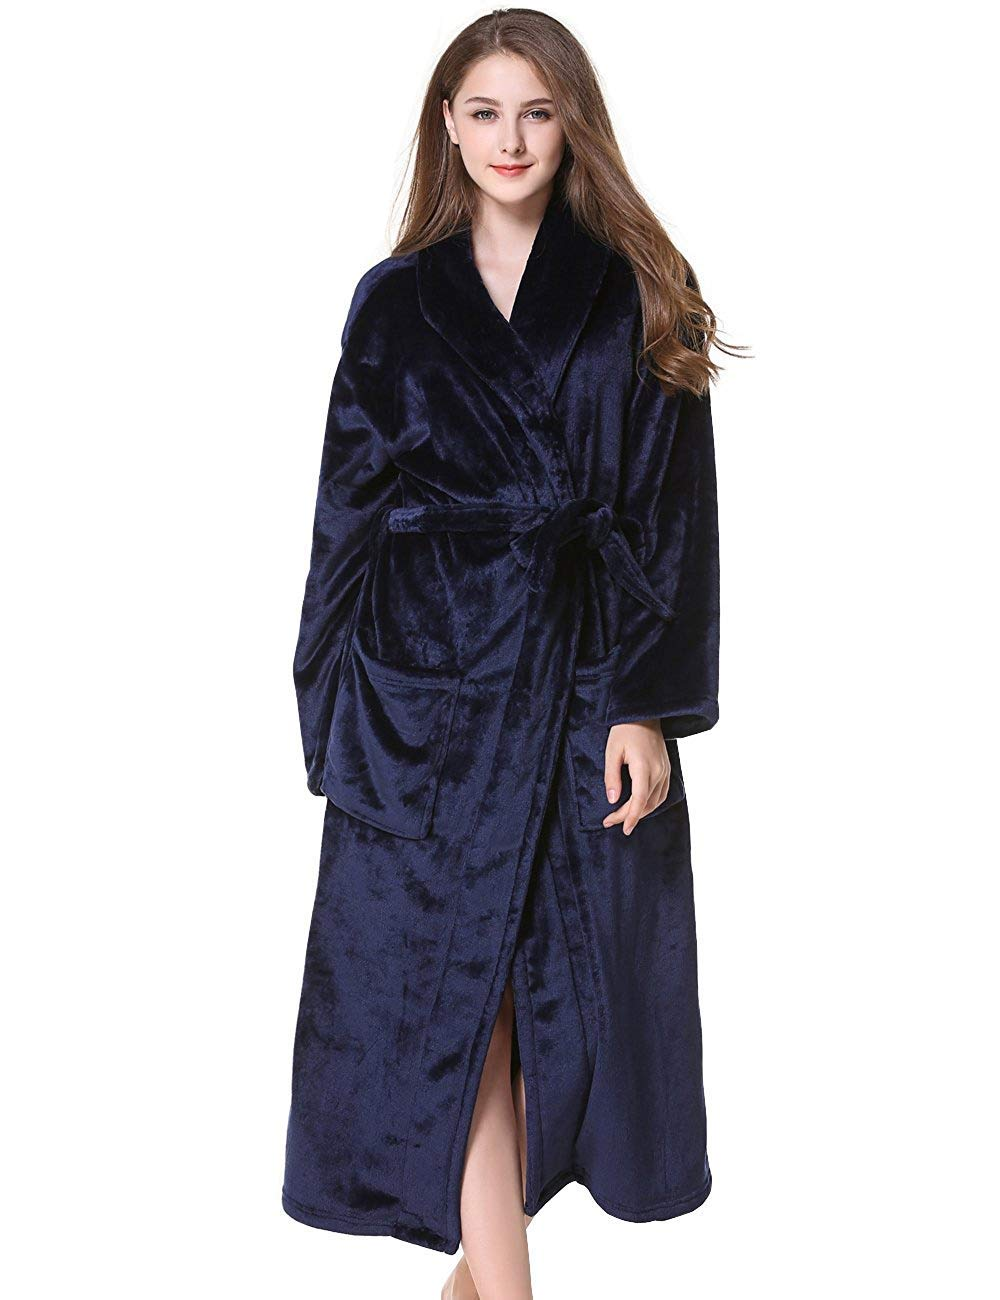 WEEN CHARM Ultra Soft Plush Robe For Men With Shawl Collar,Navy Blue,Medium